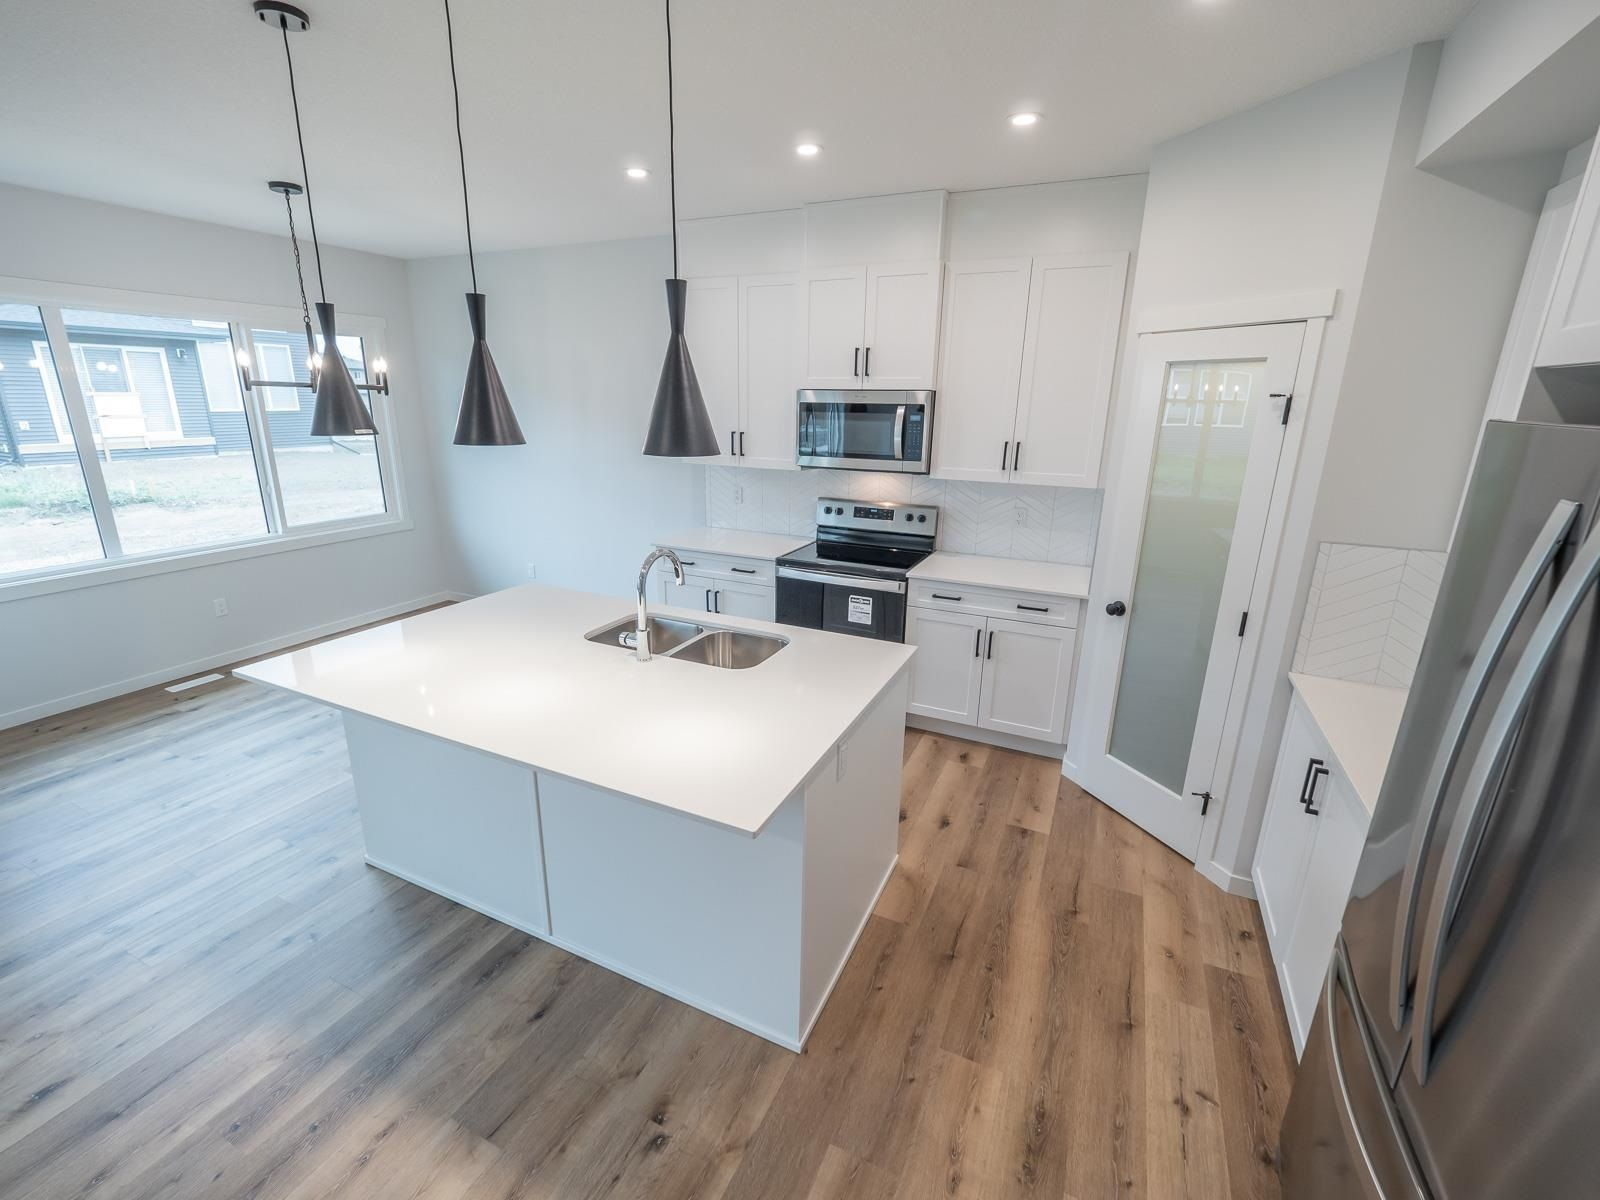 Main Photo: 20031 29 Avenue in Edmonton: Zone 57 House for sale : MLS®# E4257169